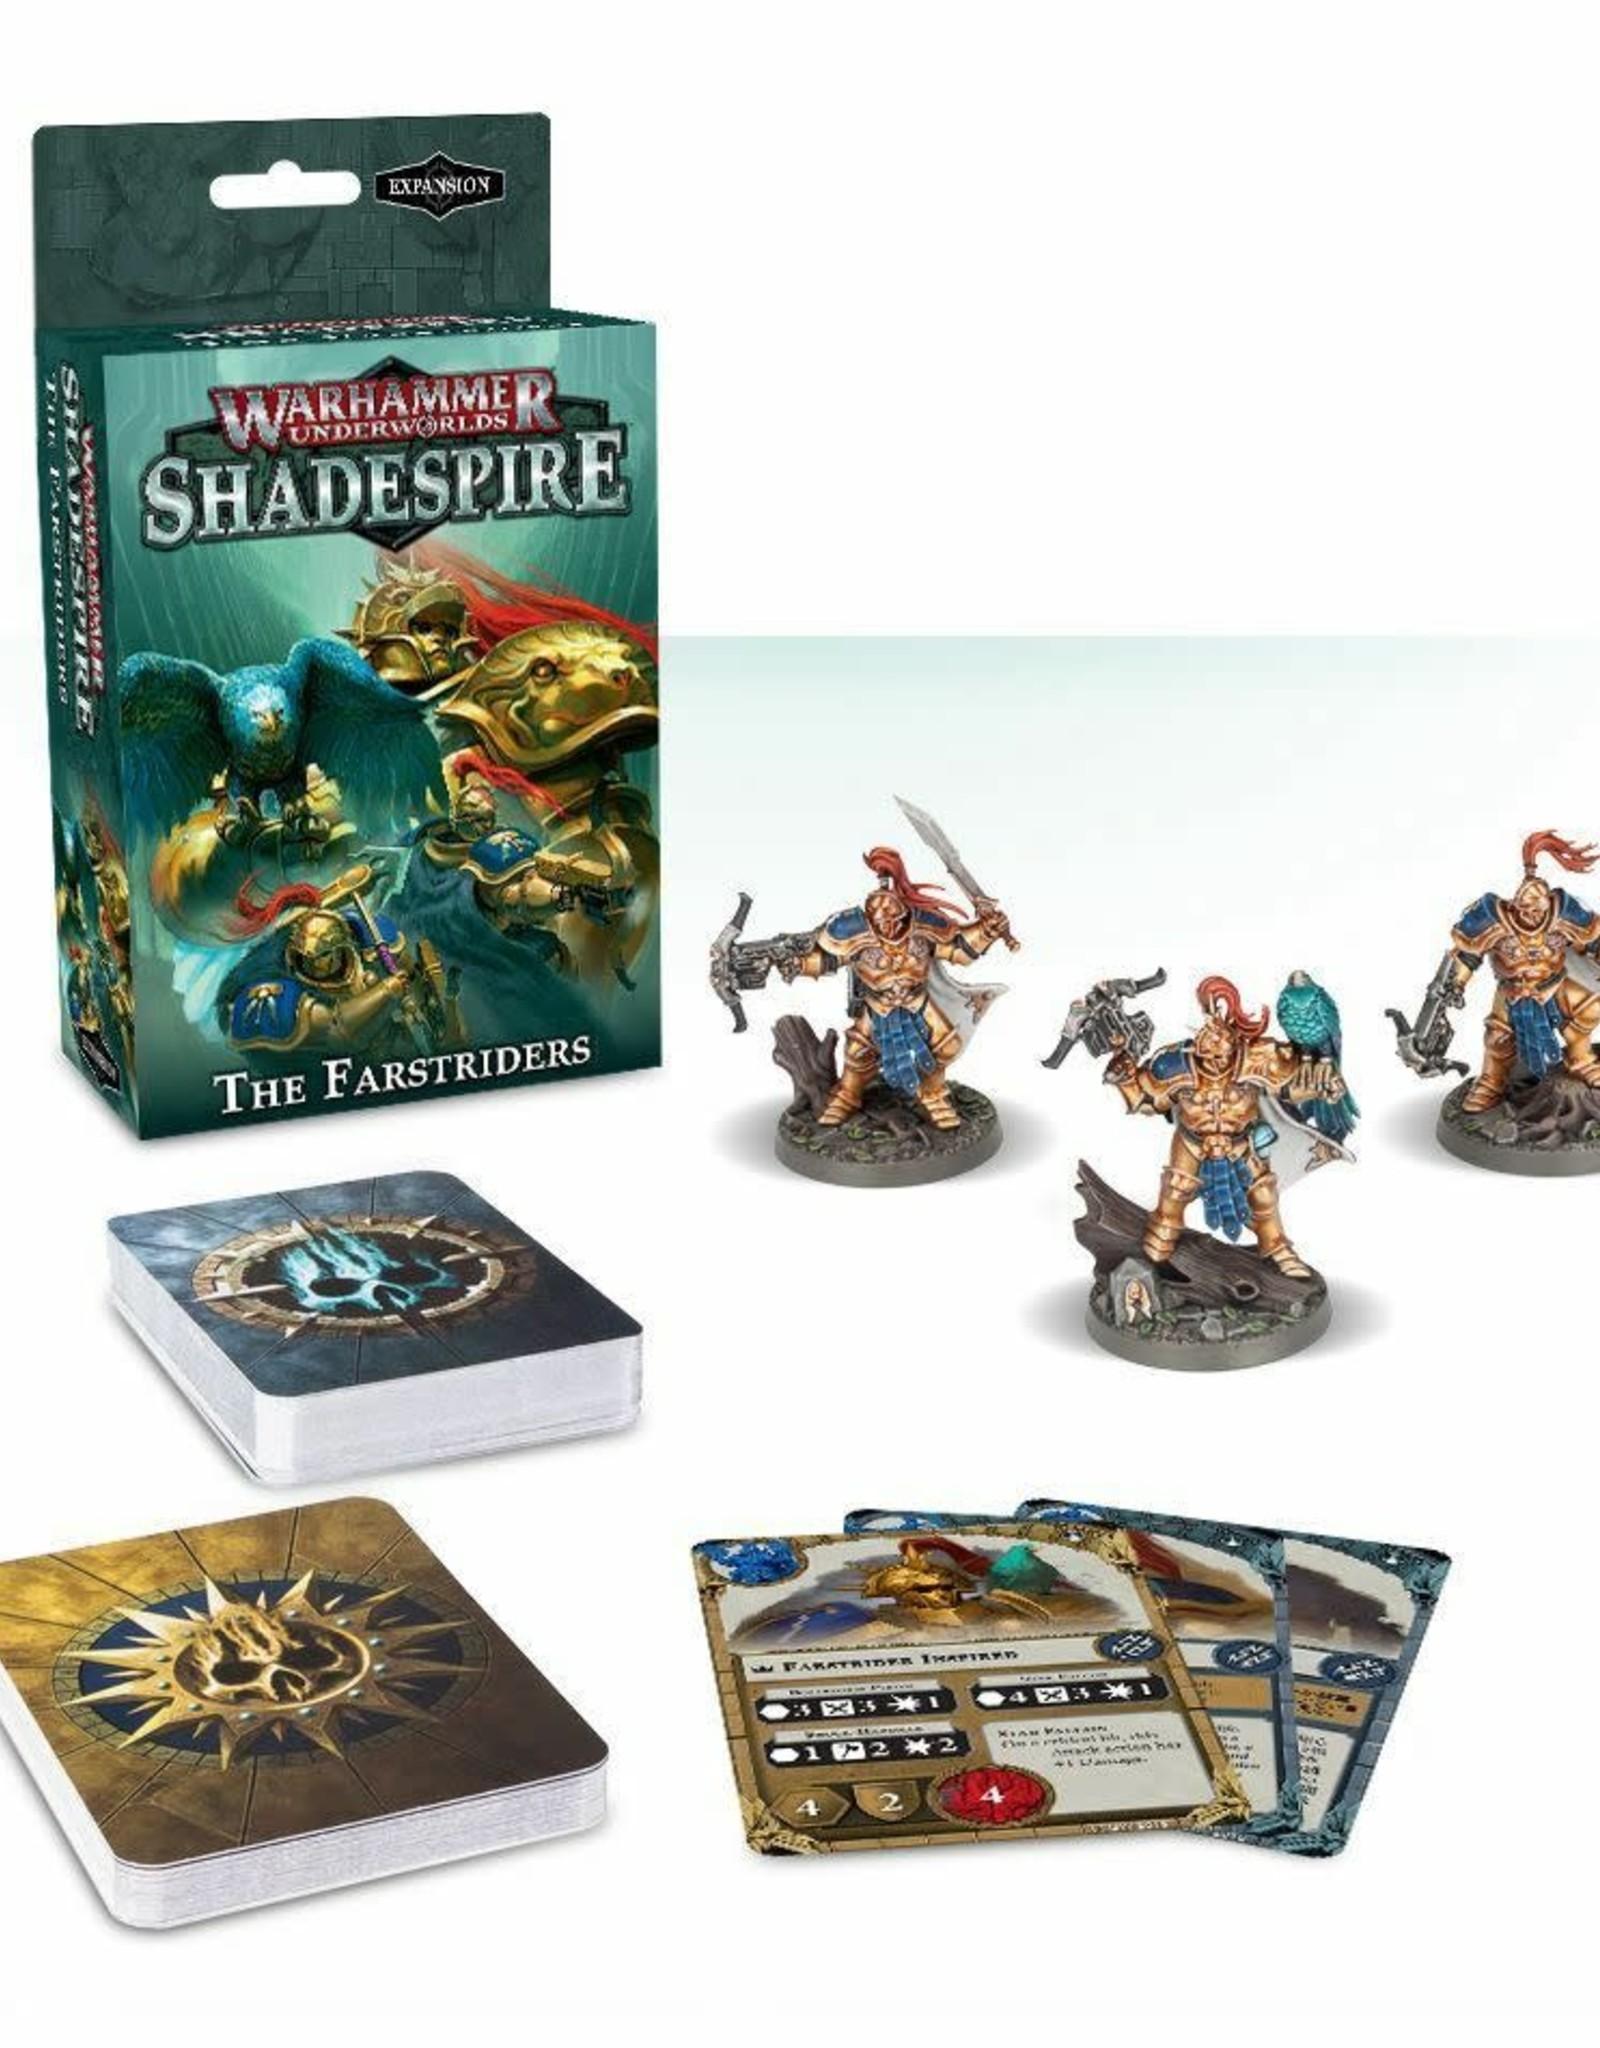 Warhammer Underworlds Warhammer Underworlds: The Farstriders